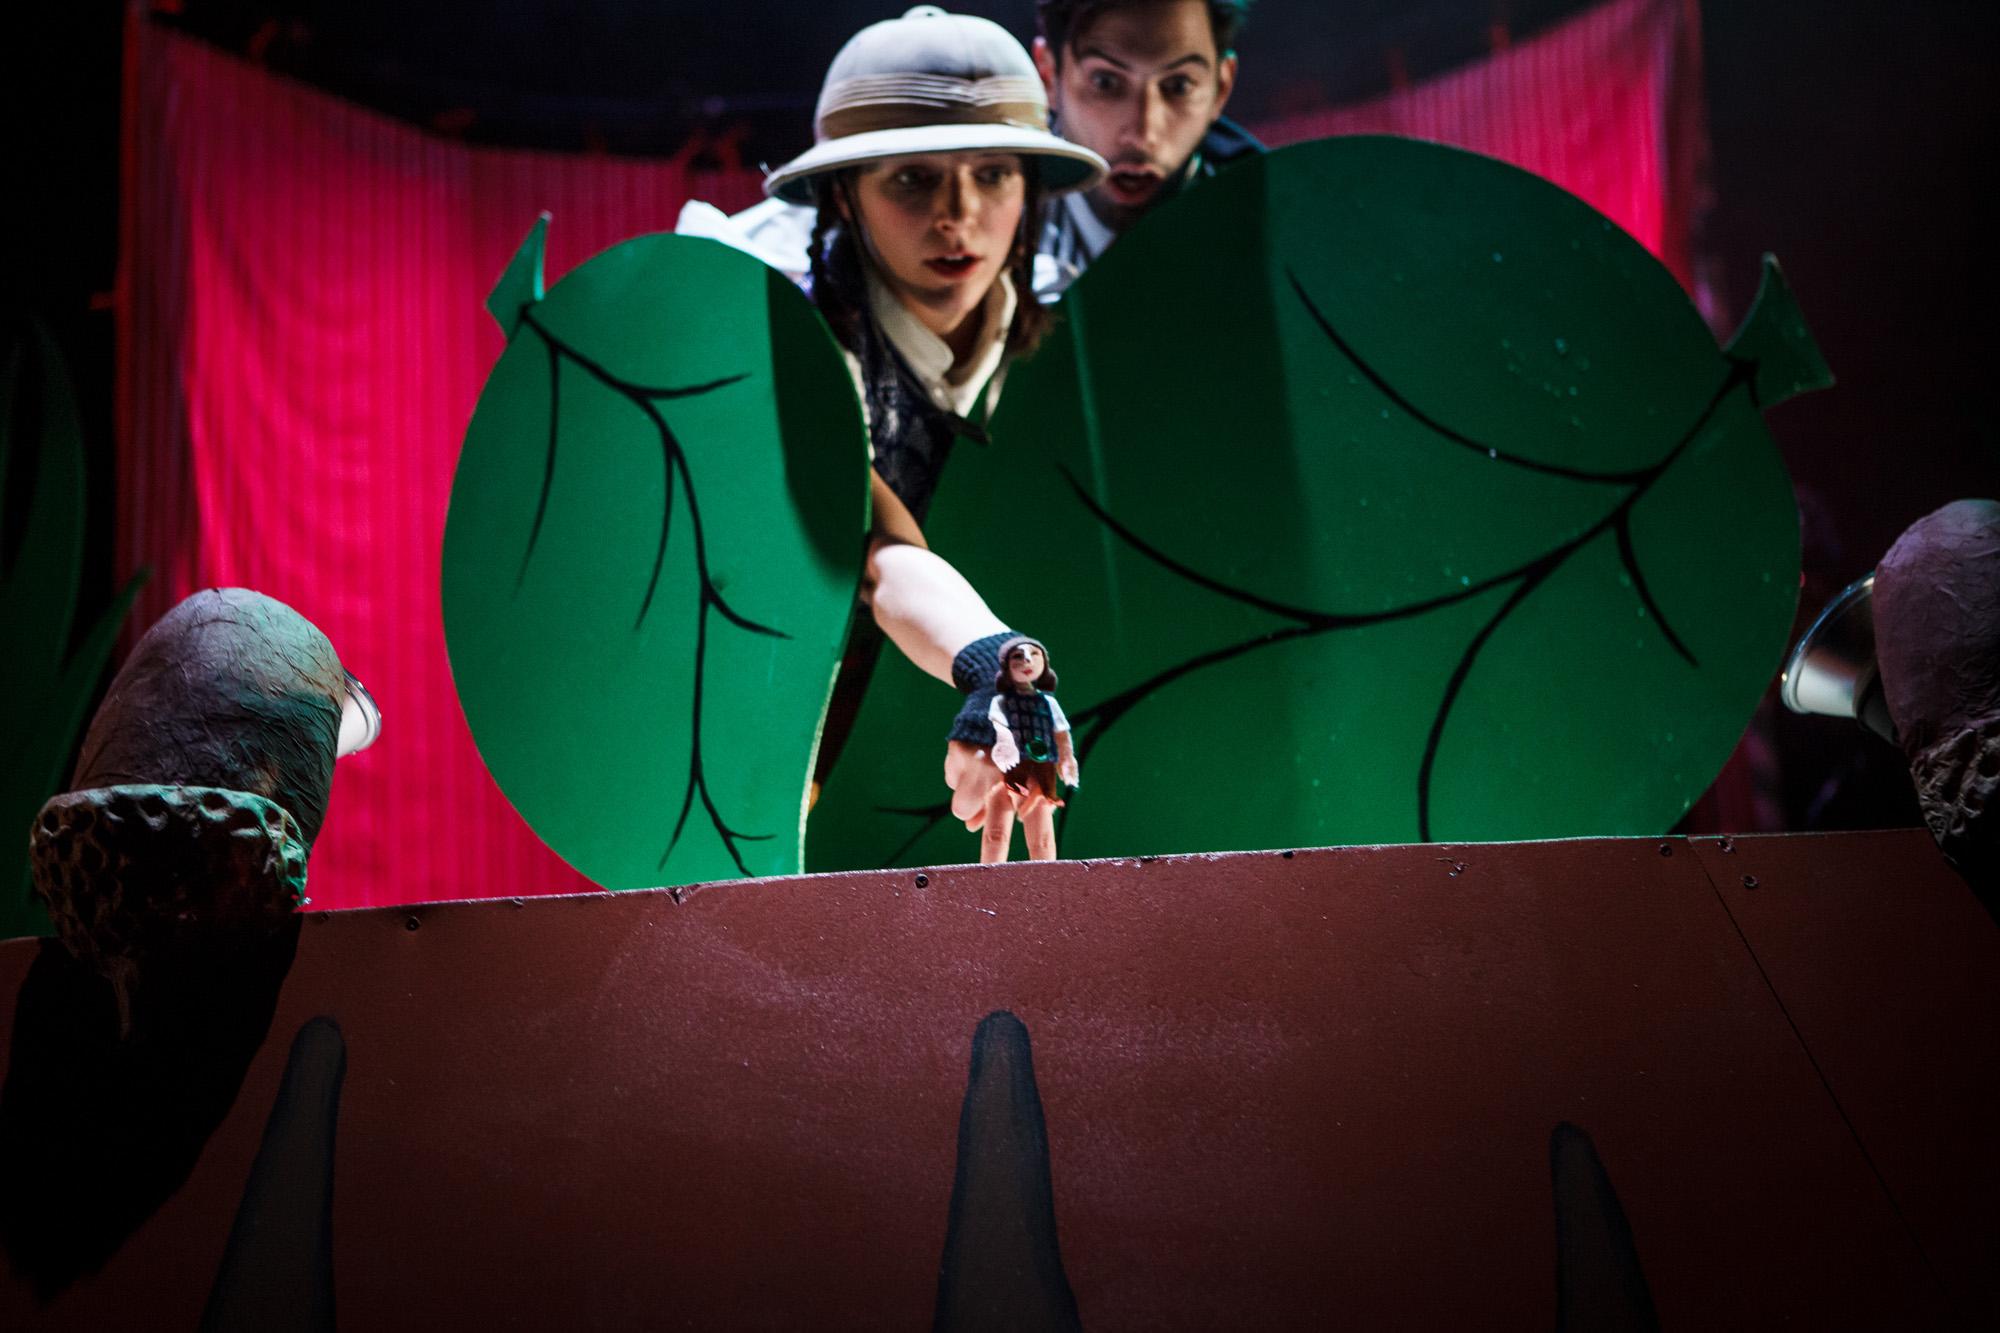 Thumbelinas-Great-Big-Adventure-IMG_0082-2.jpg